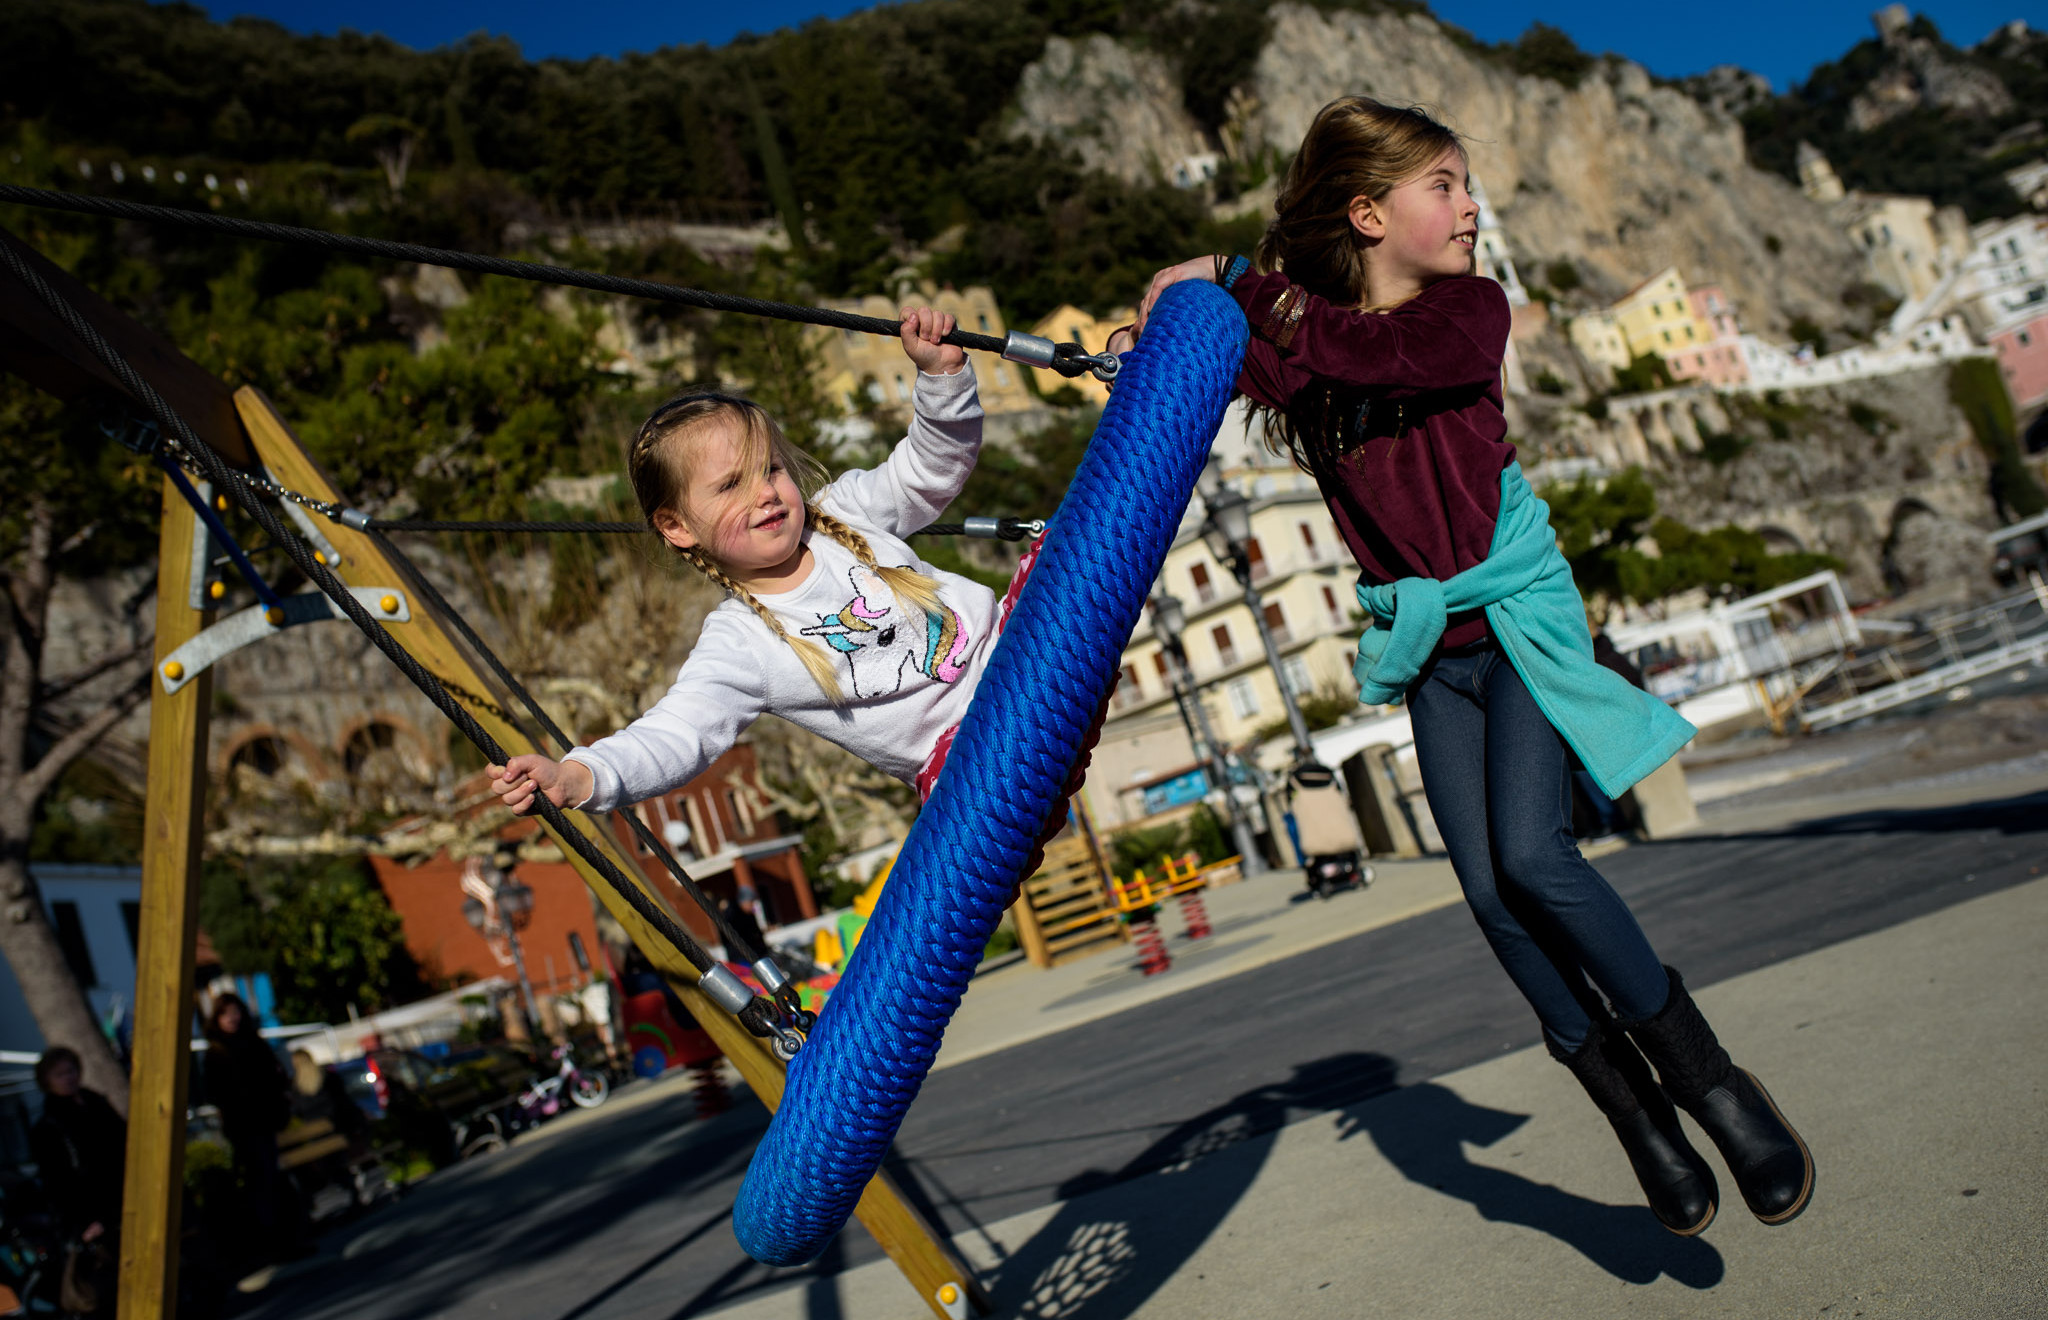 girl swings and big sister pushes